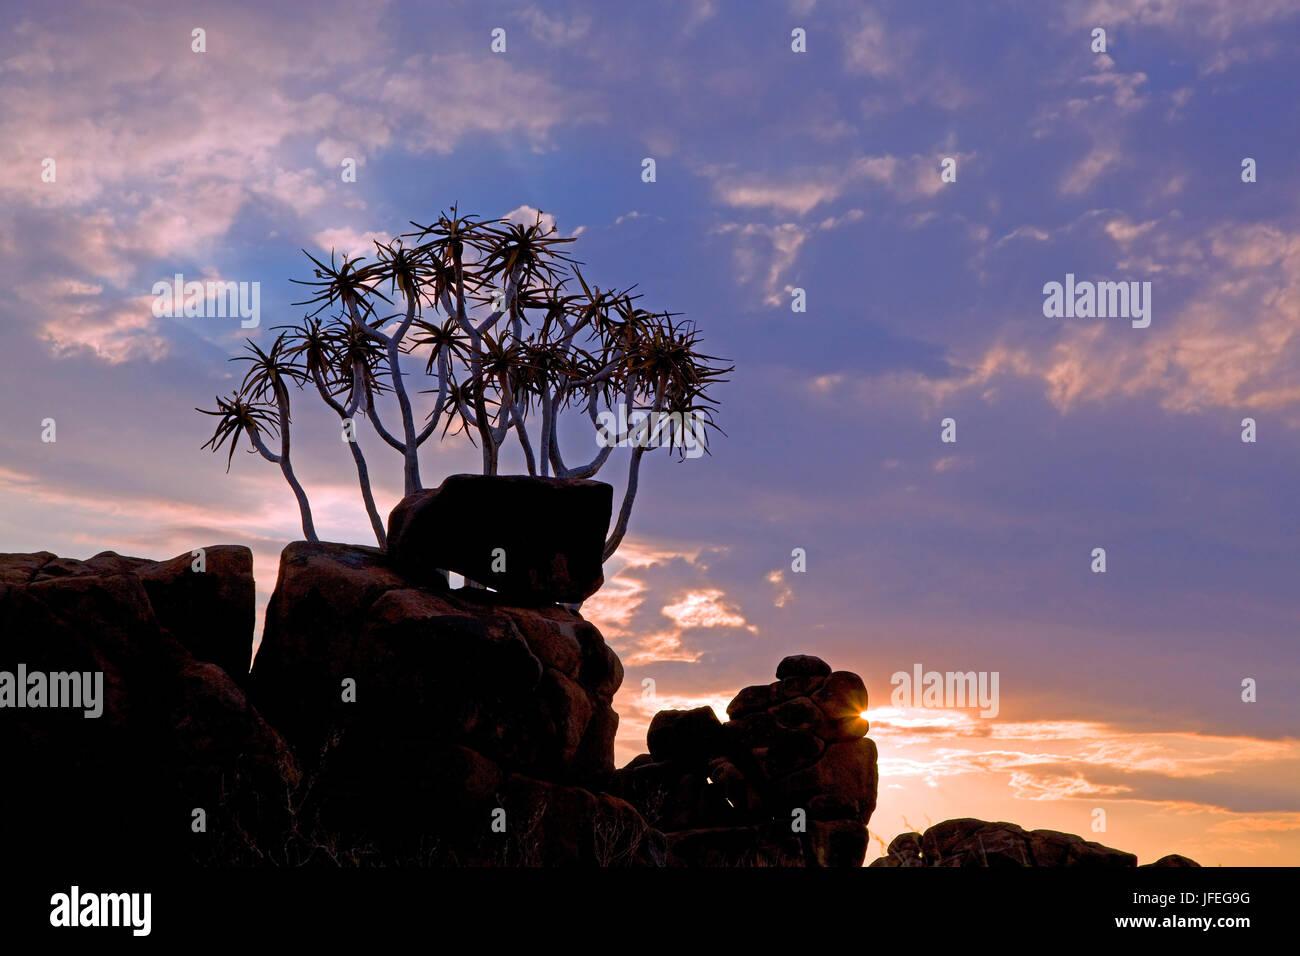 Afrika, s? Dliches Afrika, Namibia, Karas Region, Sukkulente, K? Cherbaum, Stockbild